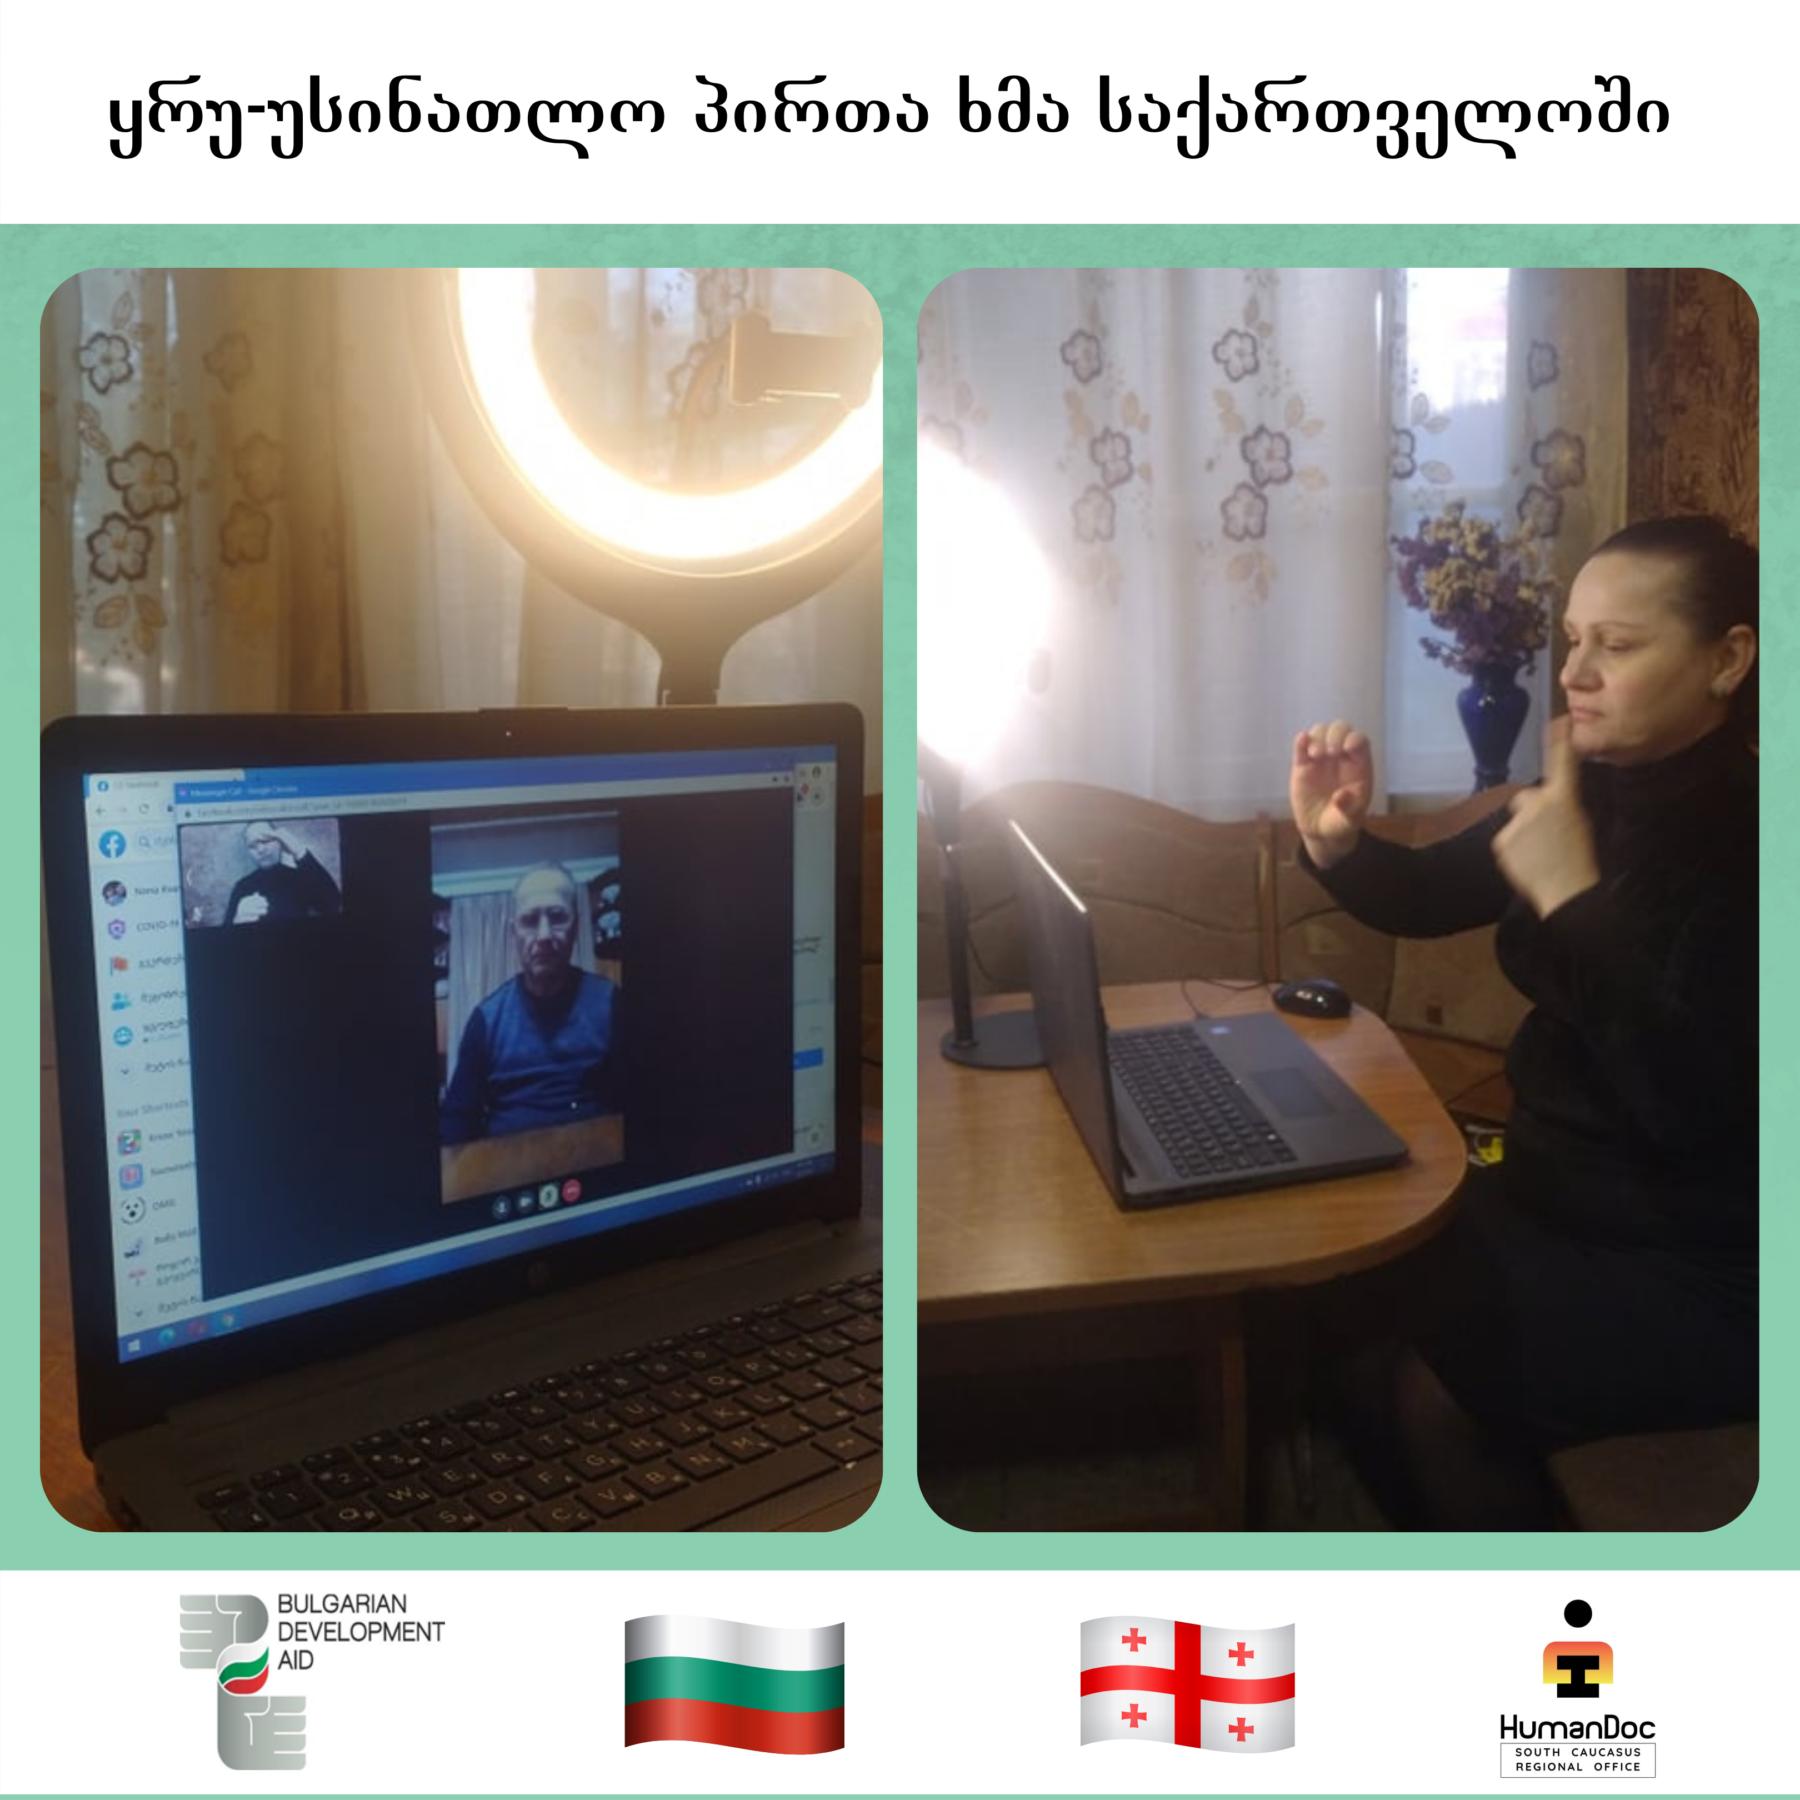 bulgarian 6 საქართველოს ყრუ-უსინათლოთა კავშირი